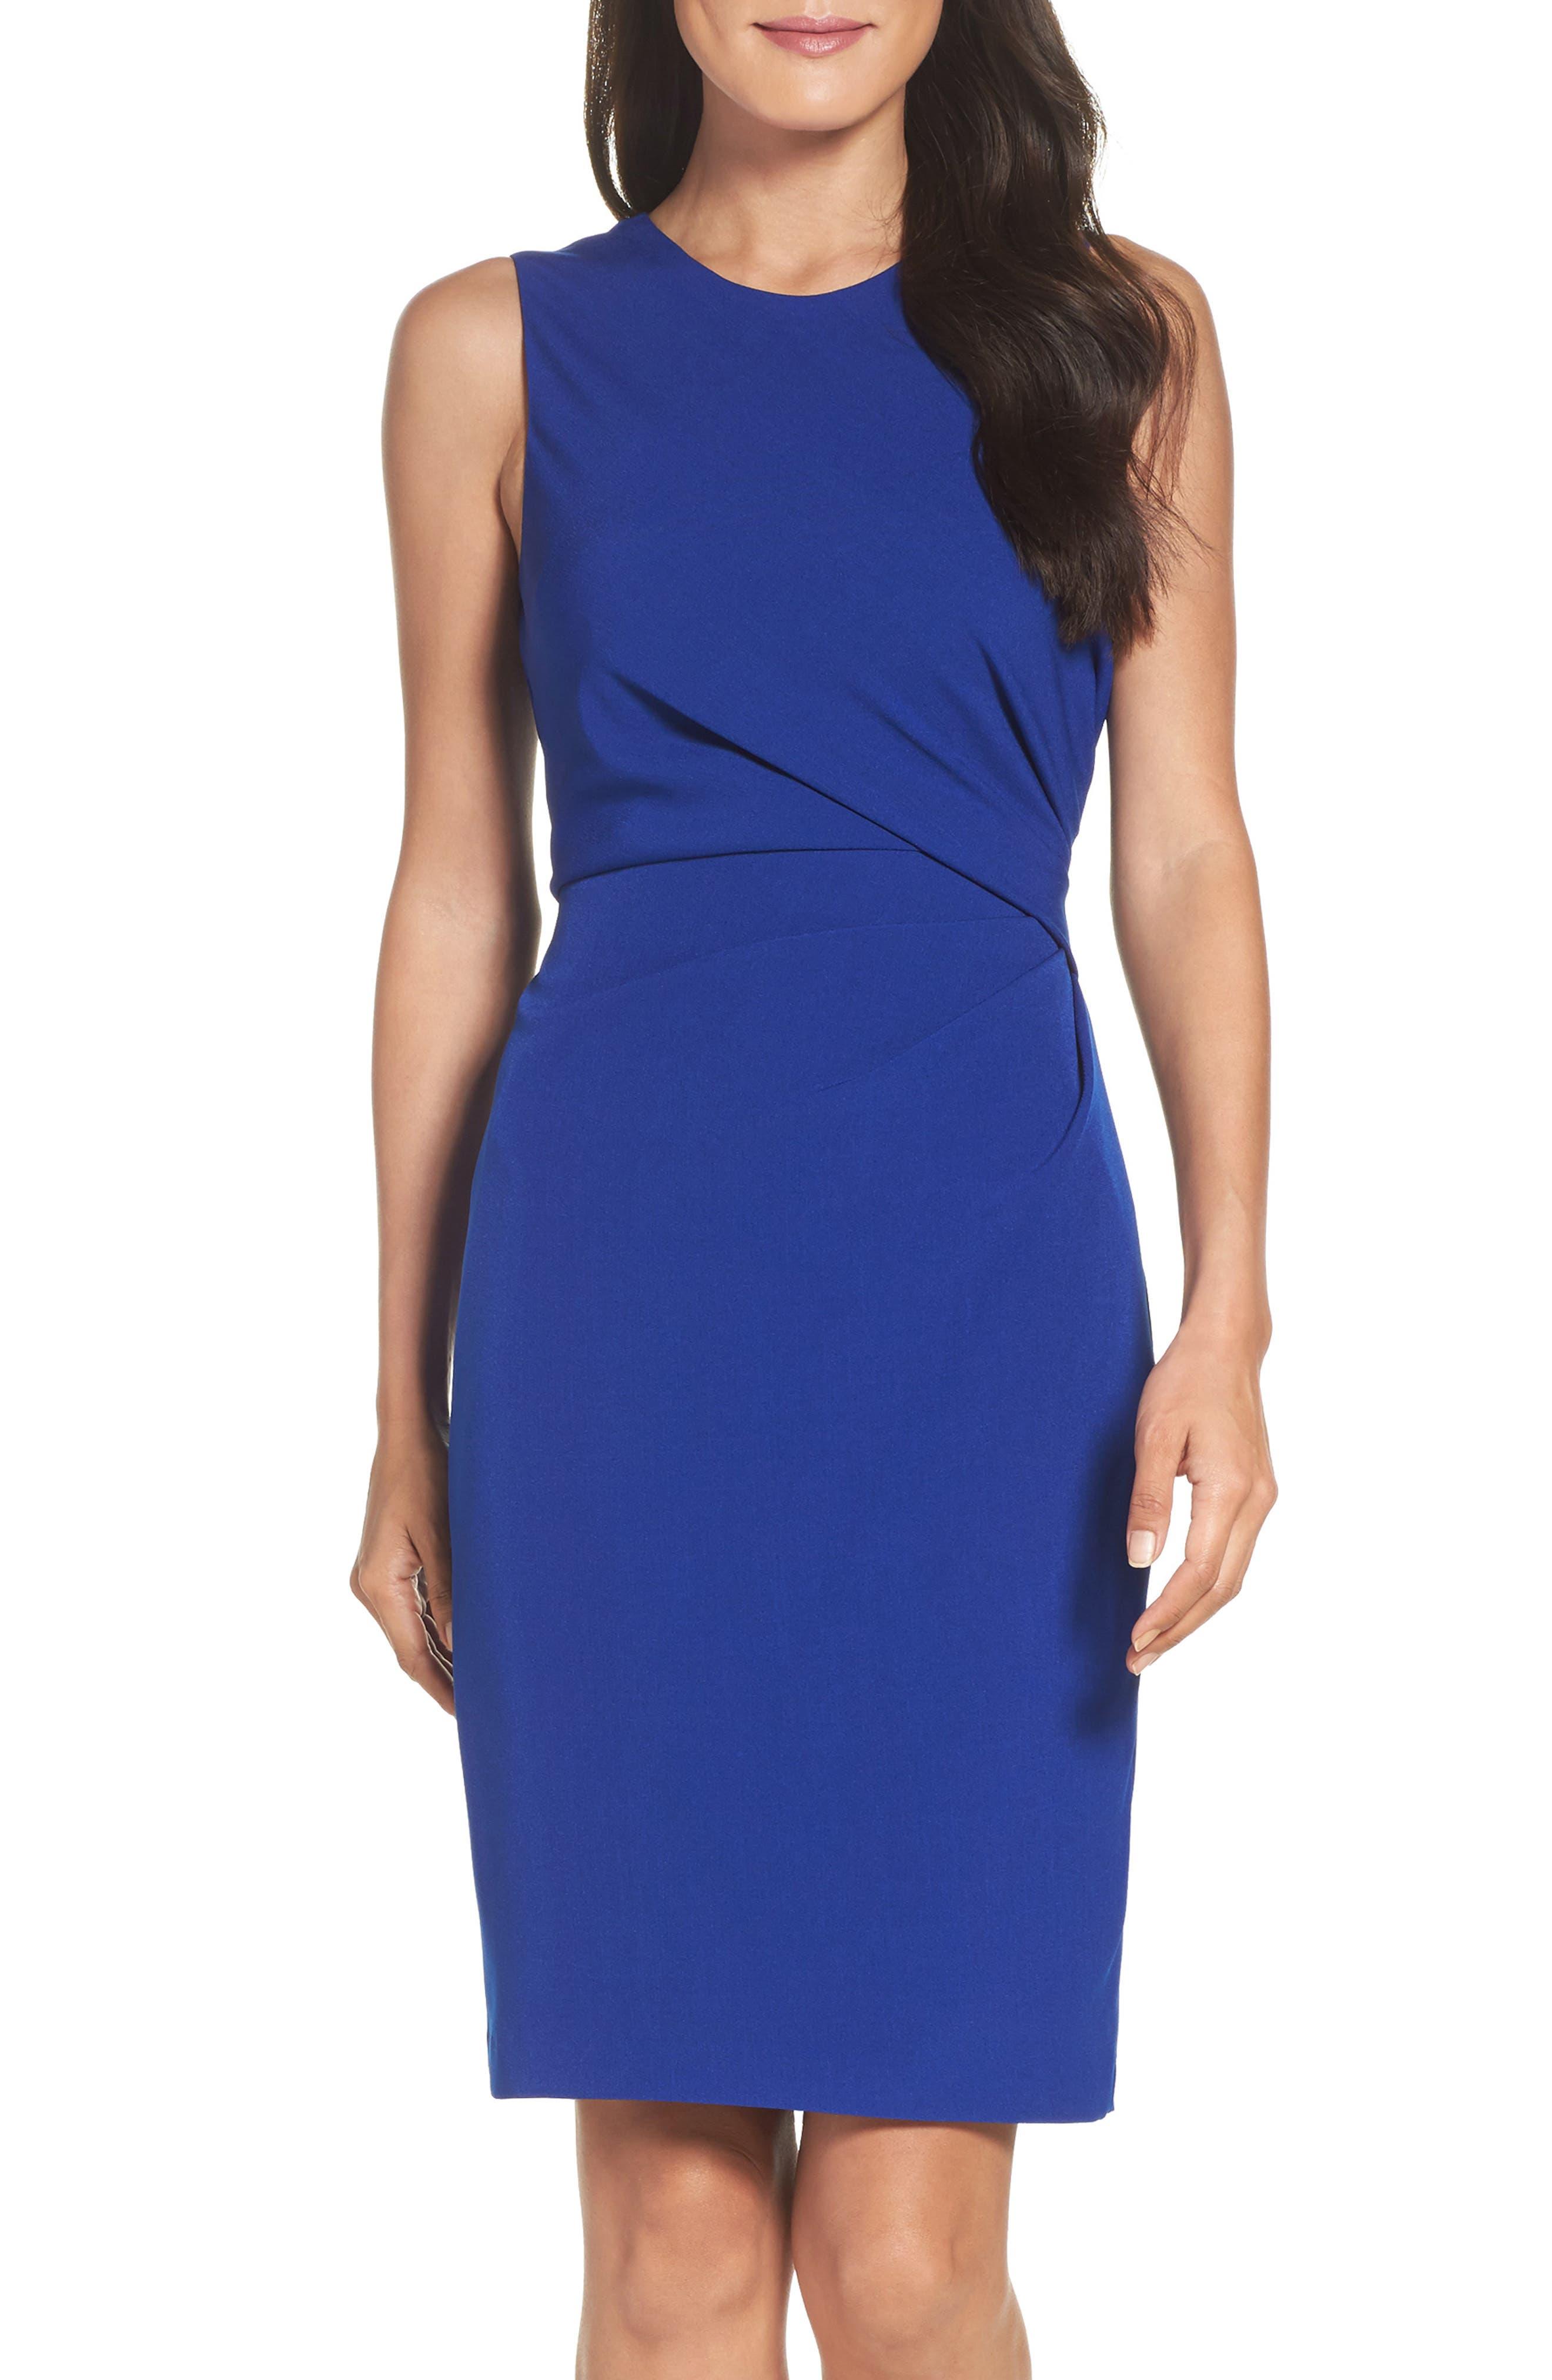 Alternate Image 1 Selected - Adrianna Papell Crepe Sheath Dress